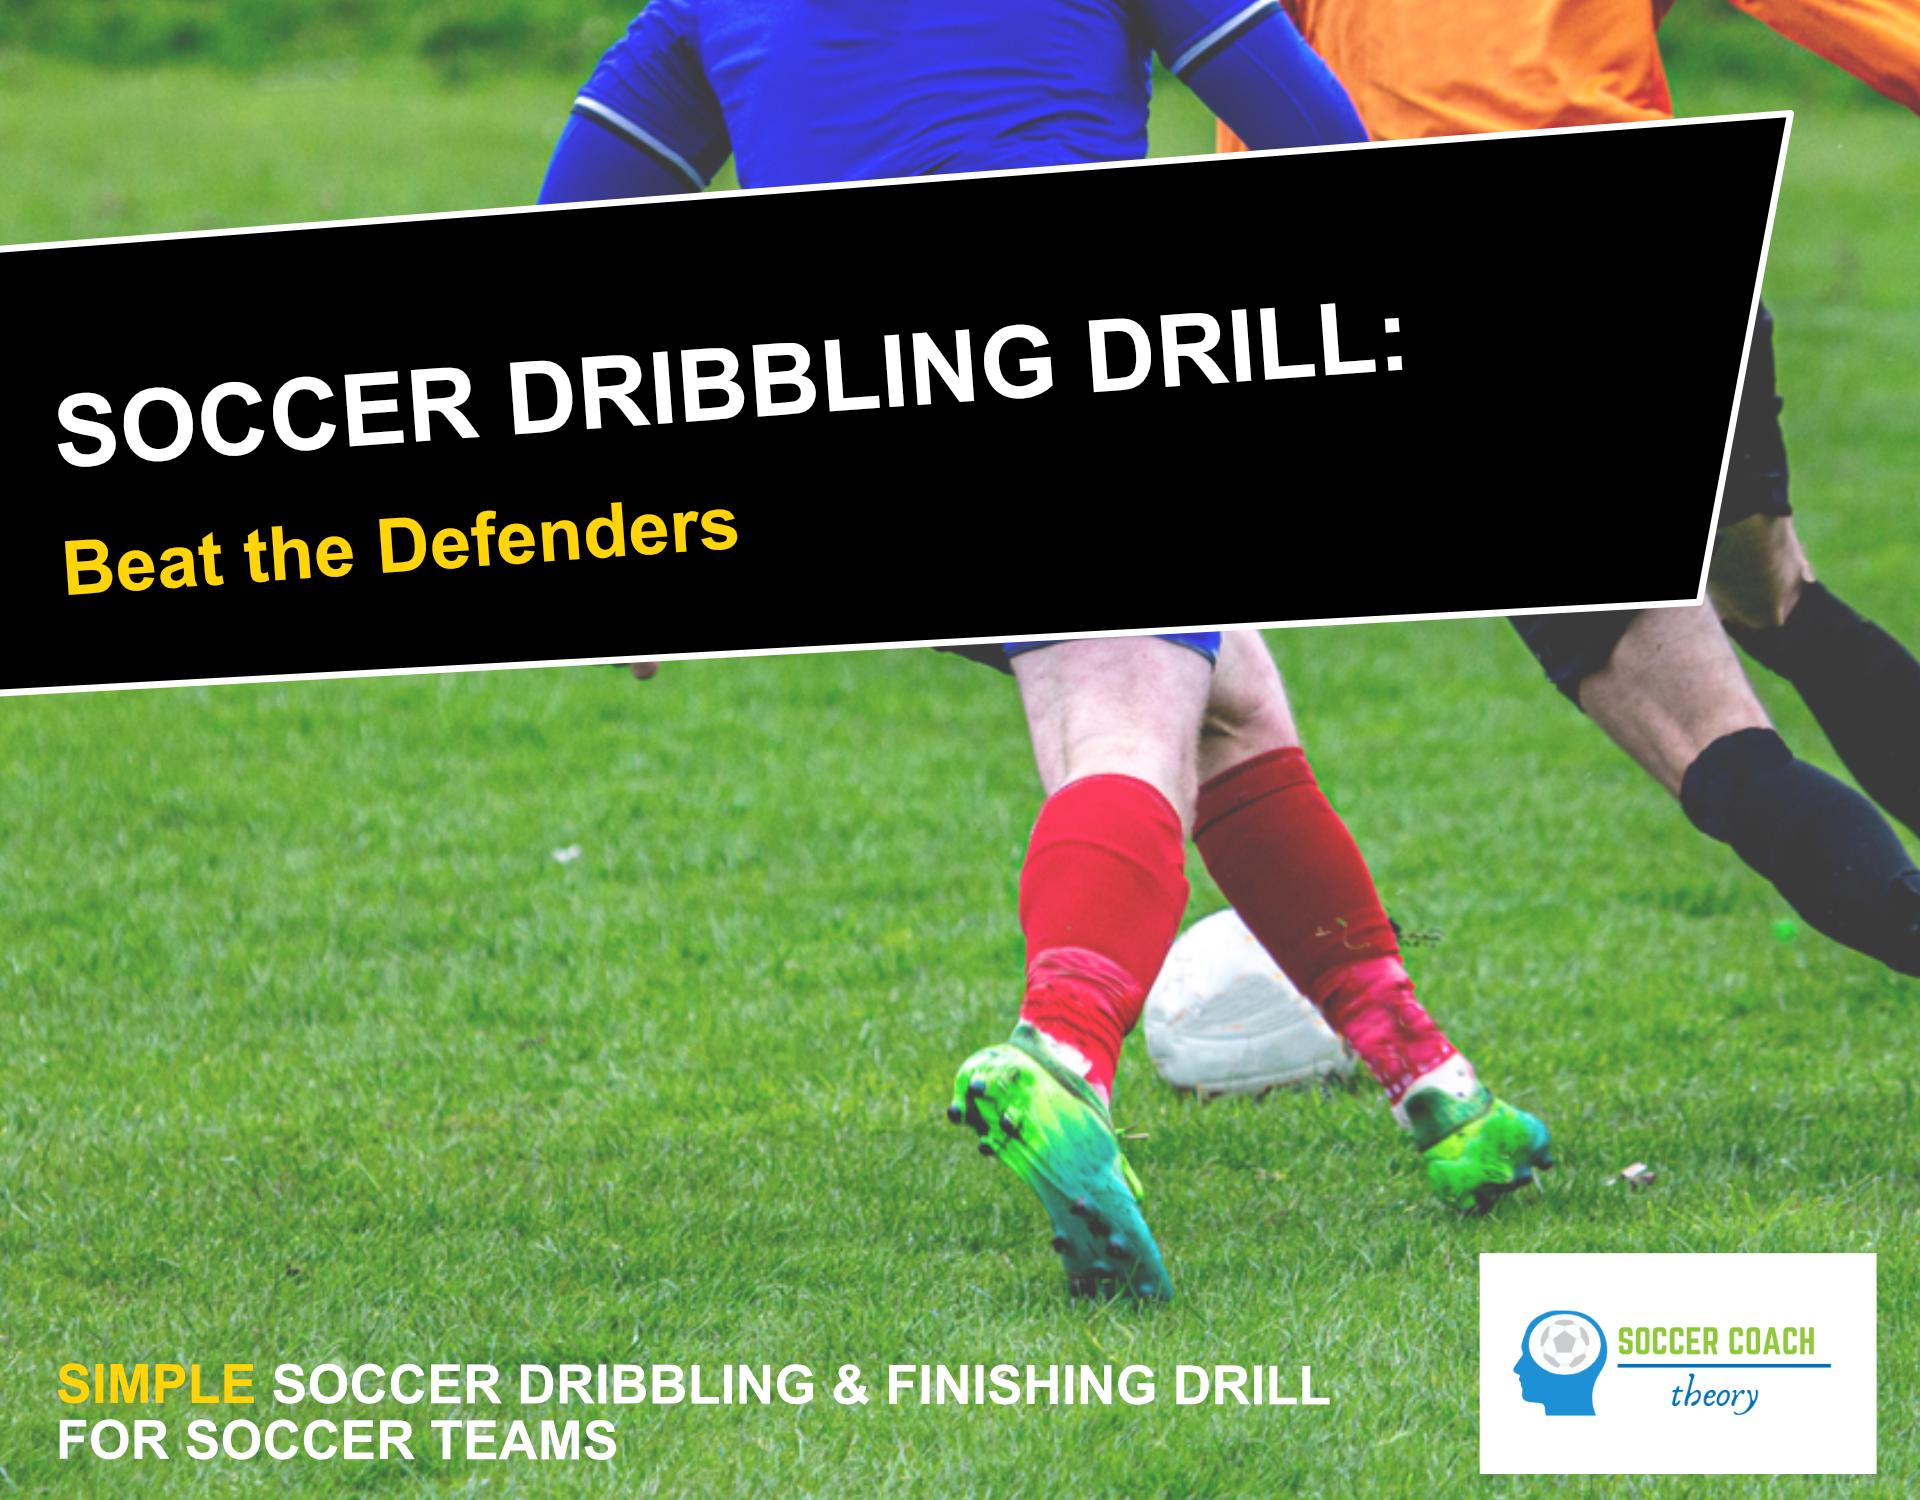 Soccer Dribbling Drill: Beat the Defenders